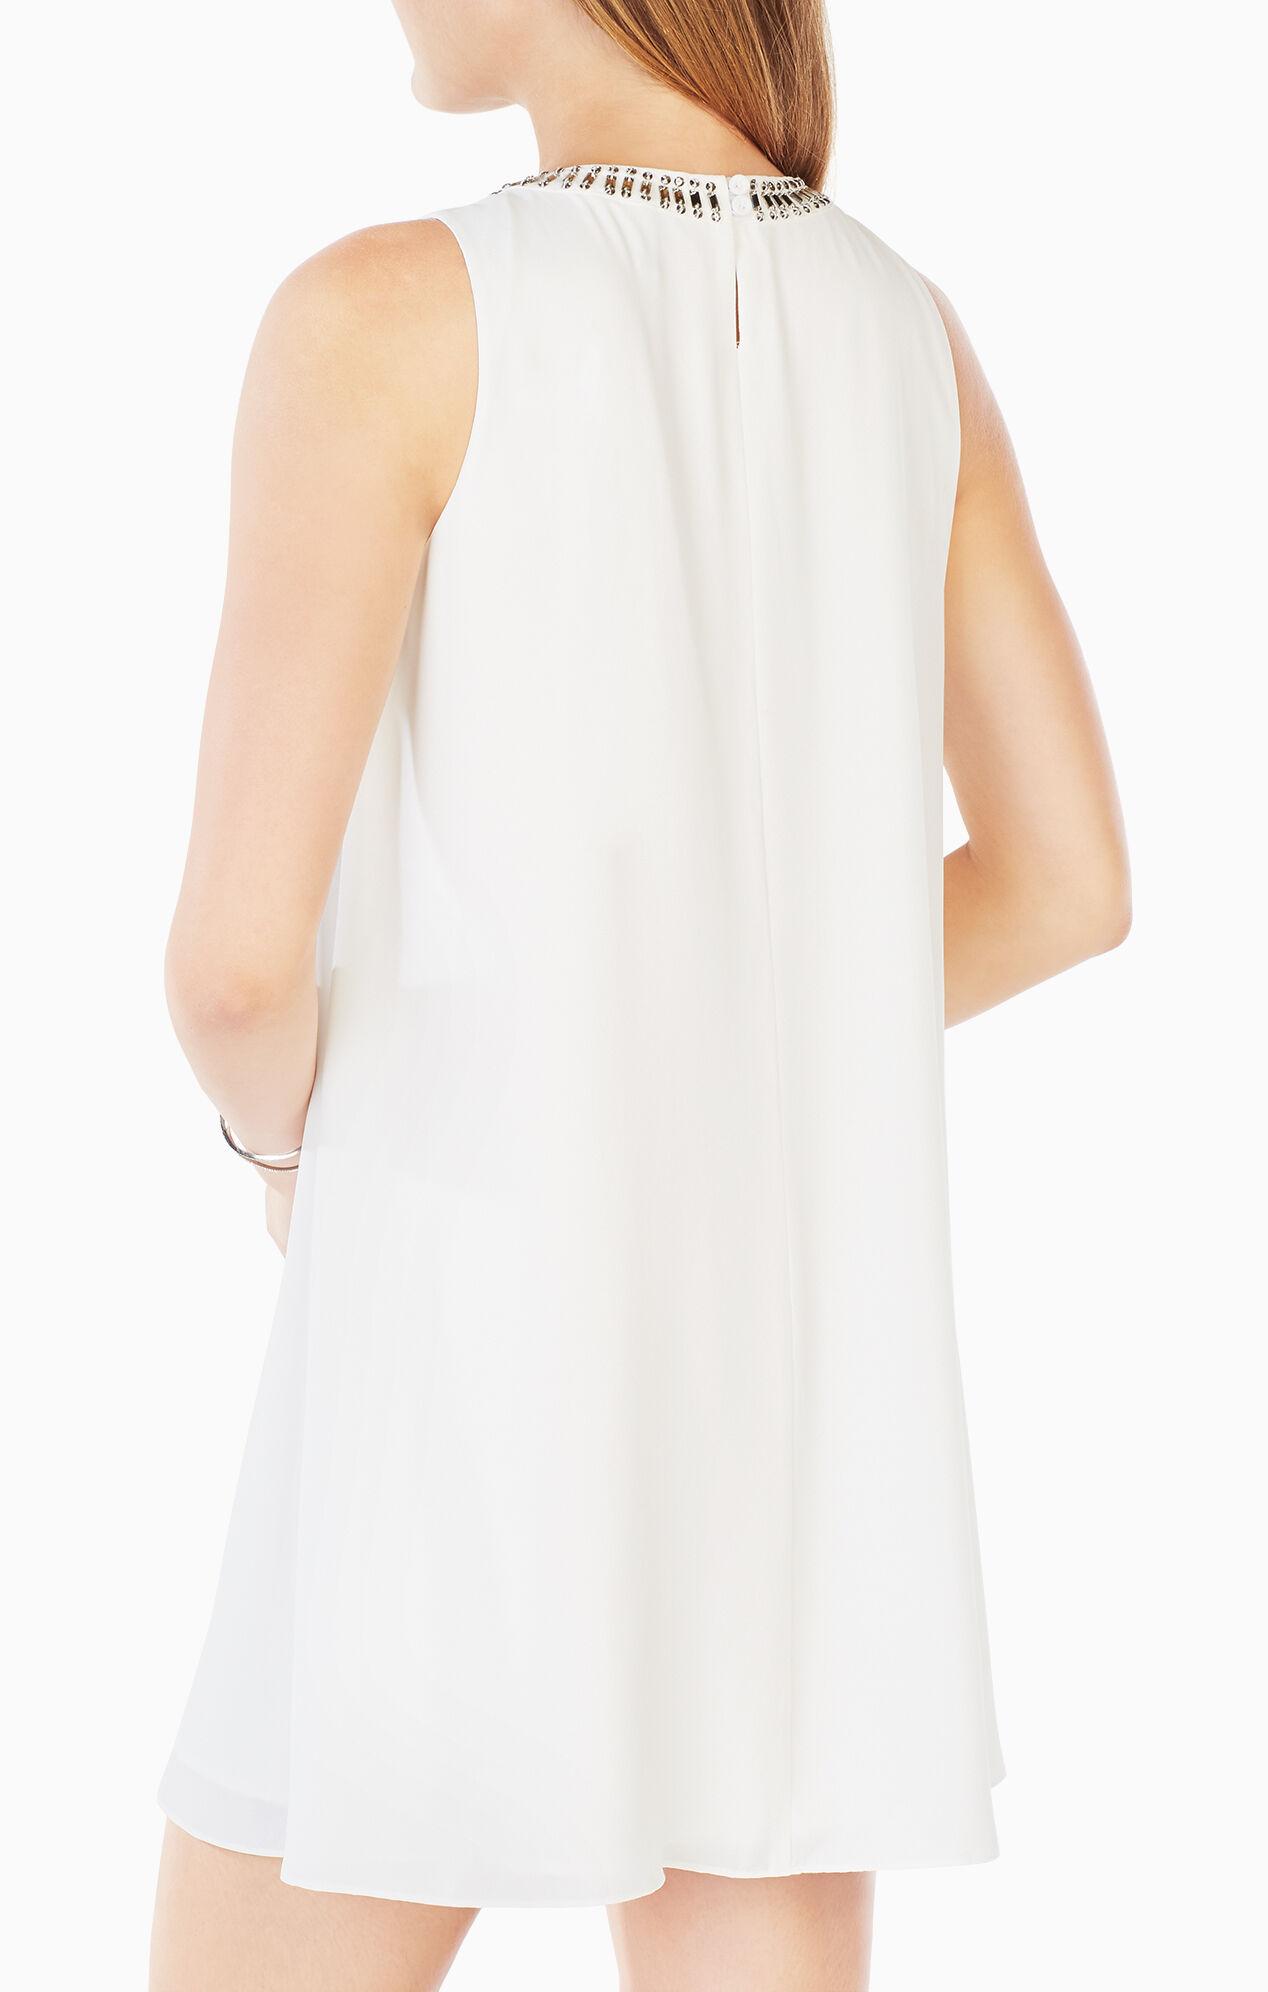 Lilleth Beaded Ruffled Dress